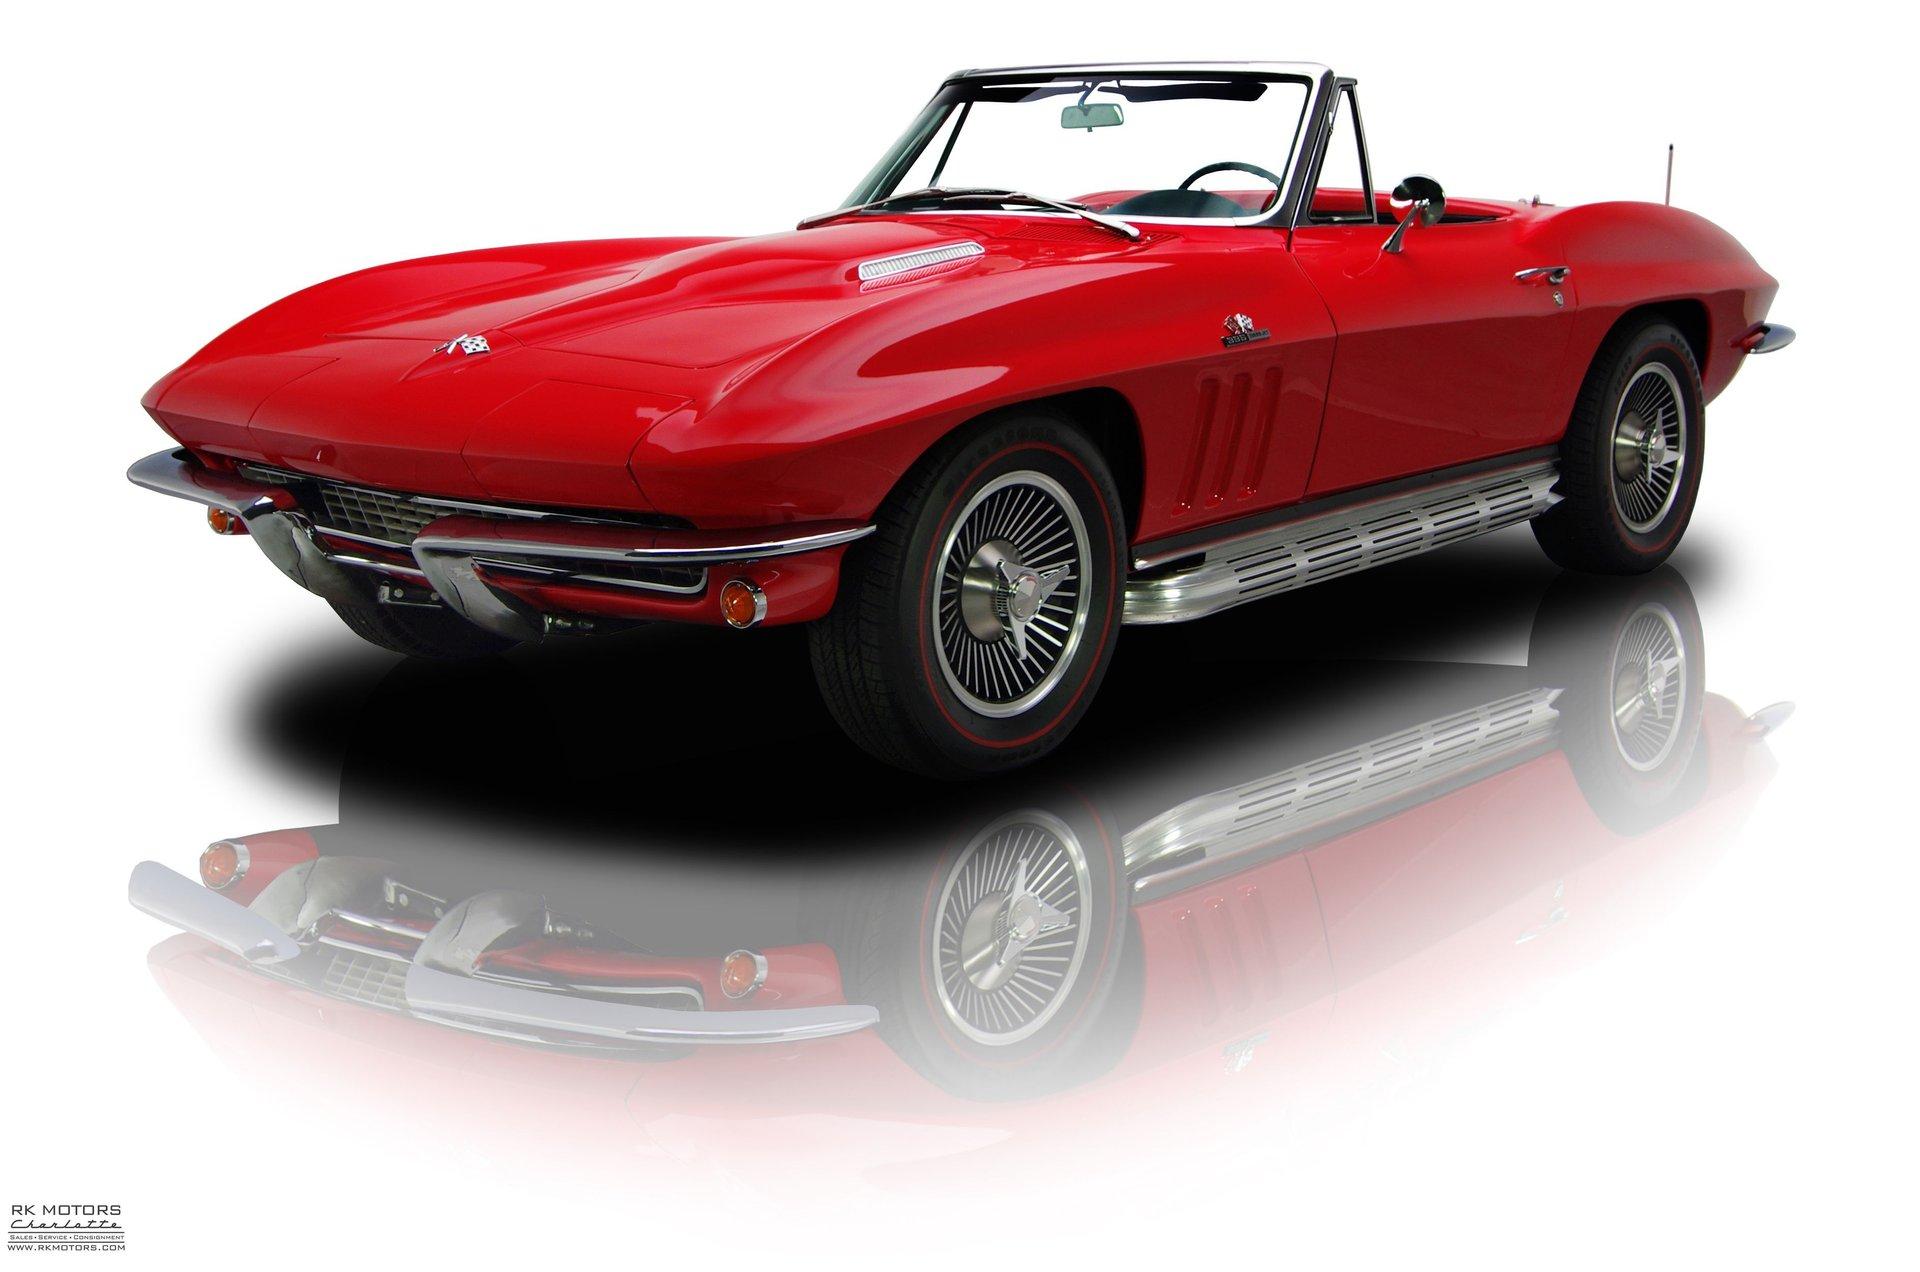 Red classic corvette investment transact investment